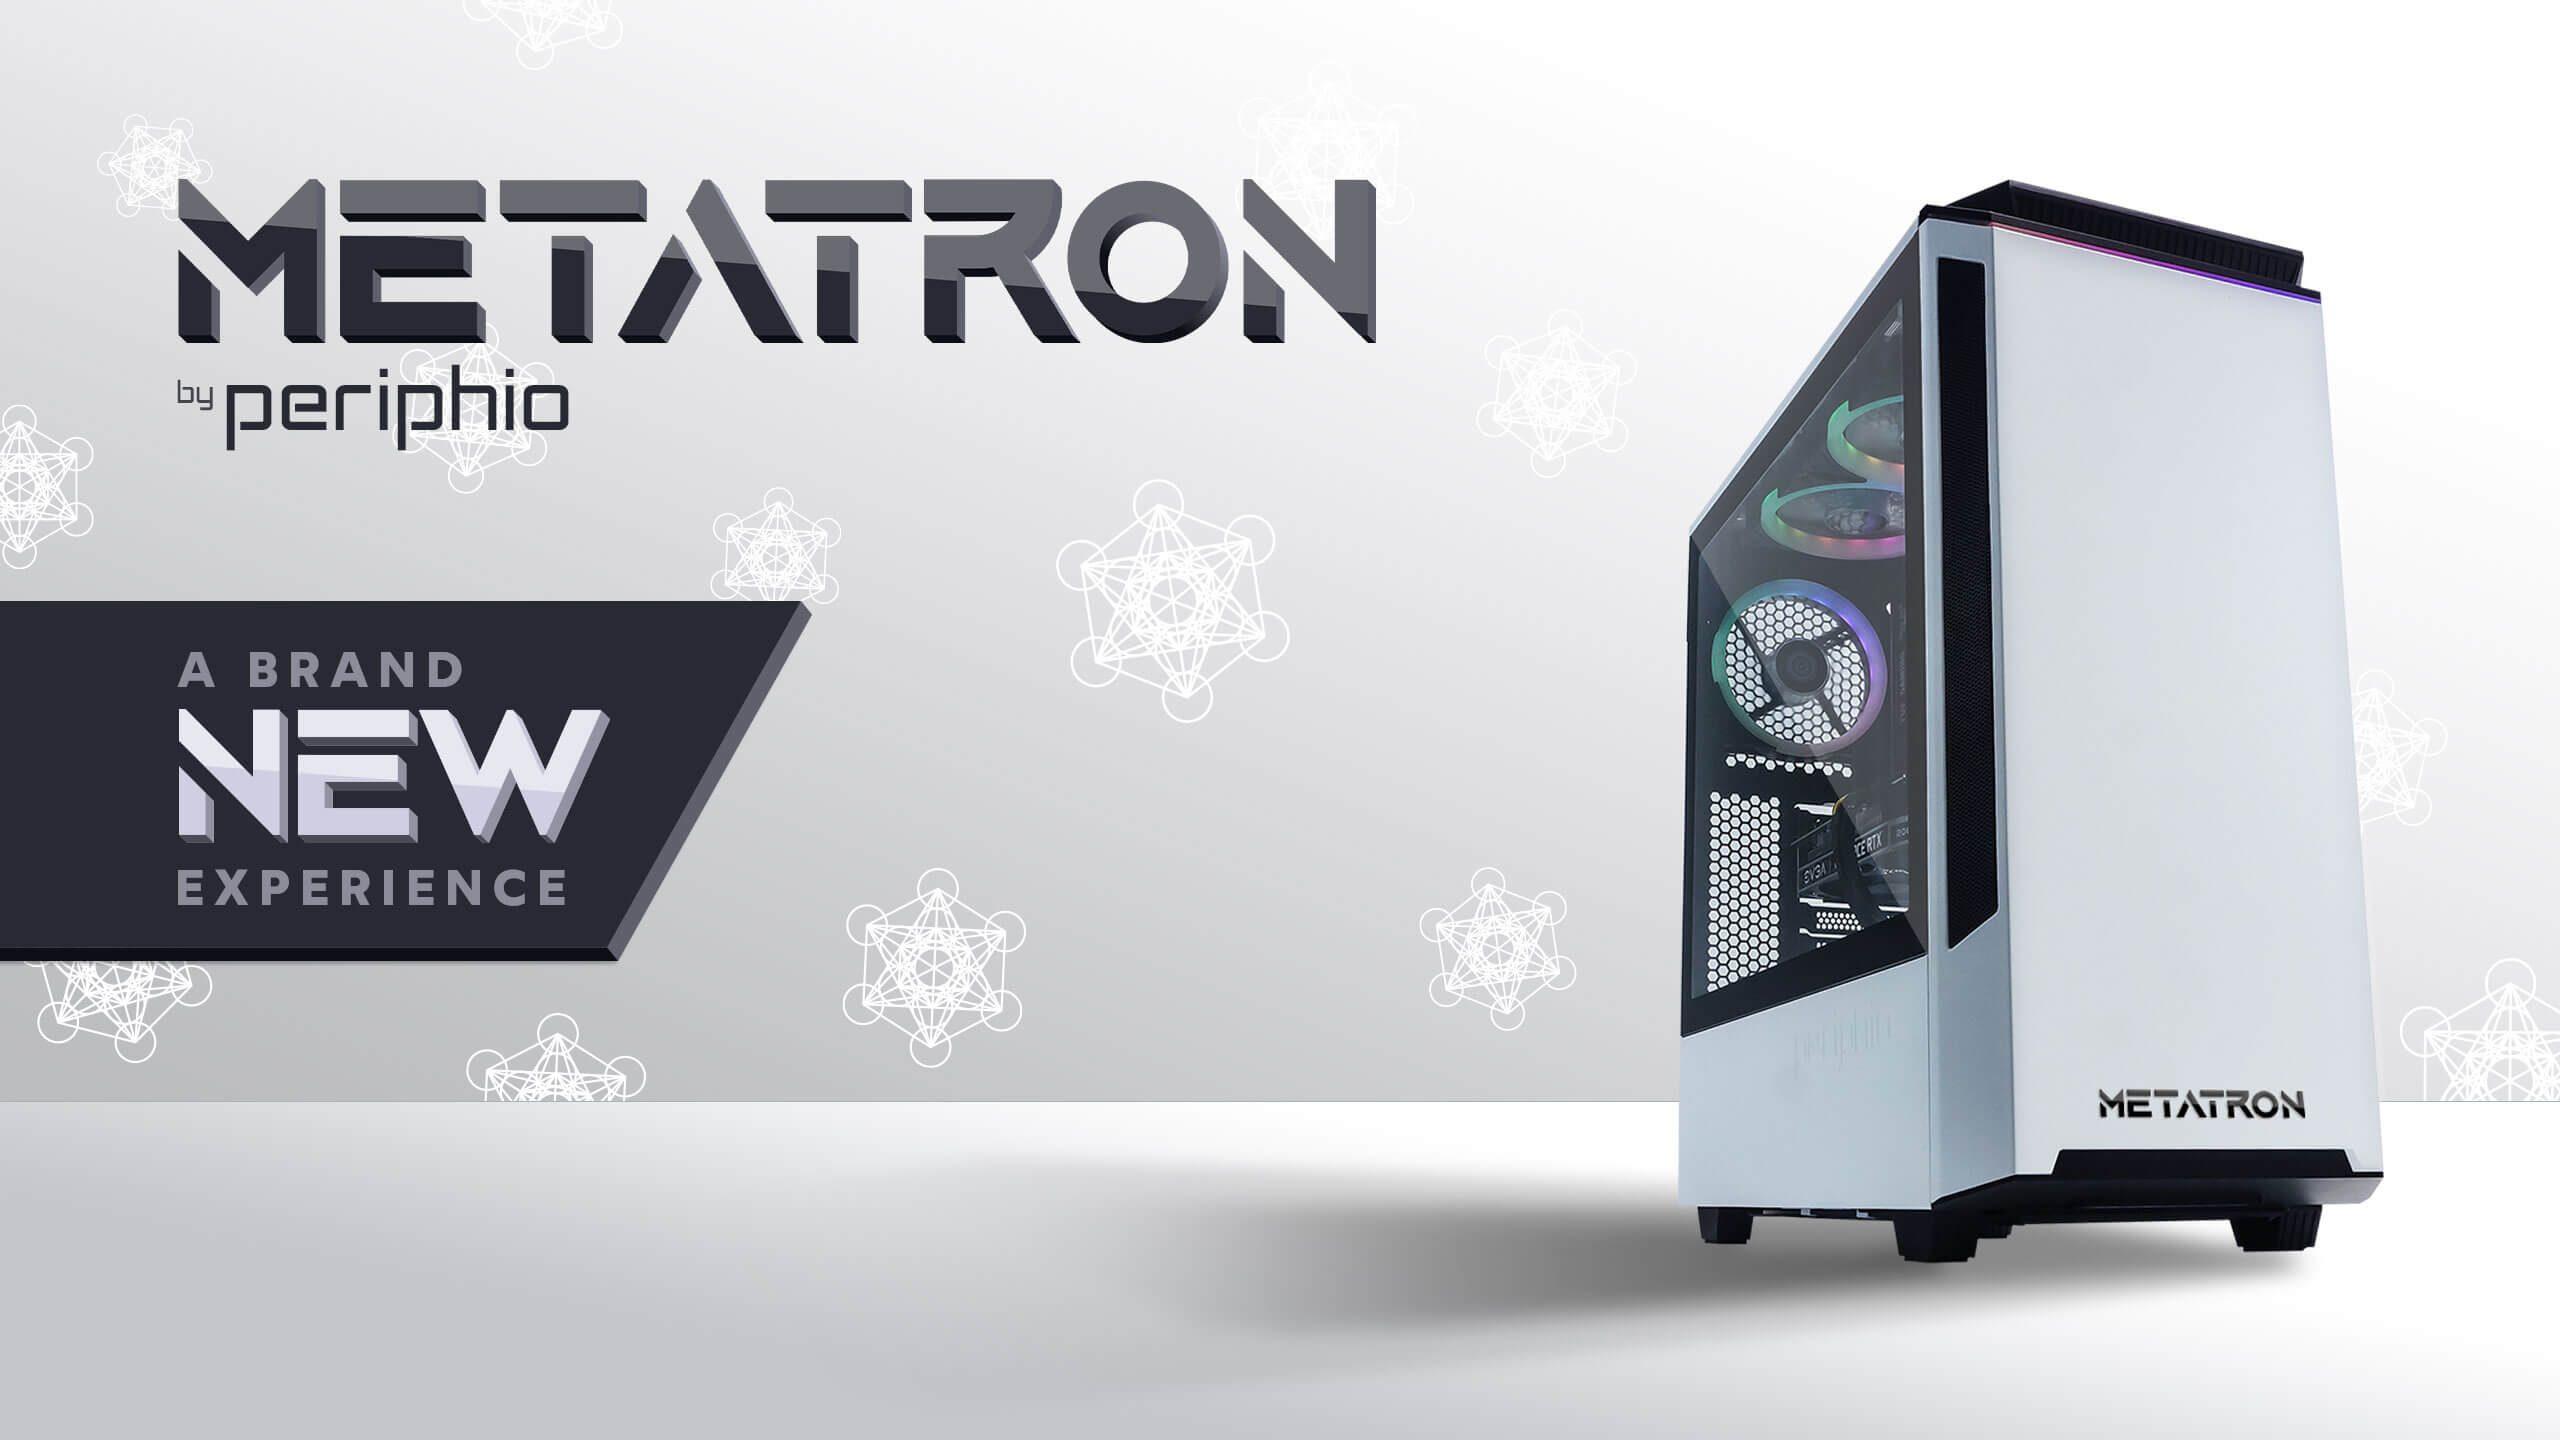 Periphio Metatron A Brand New Experience